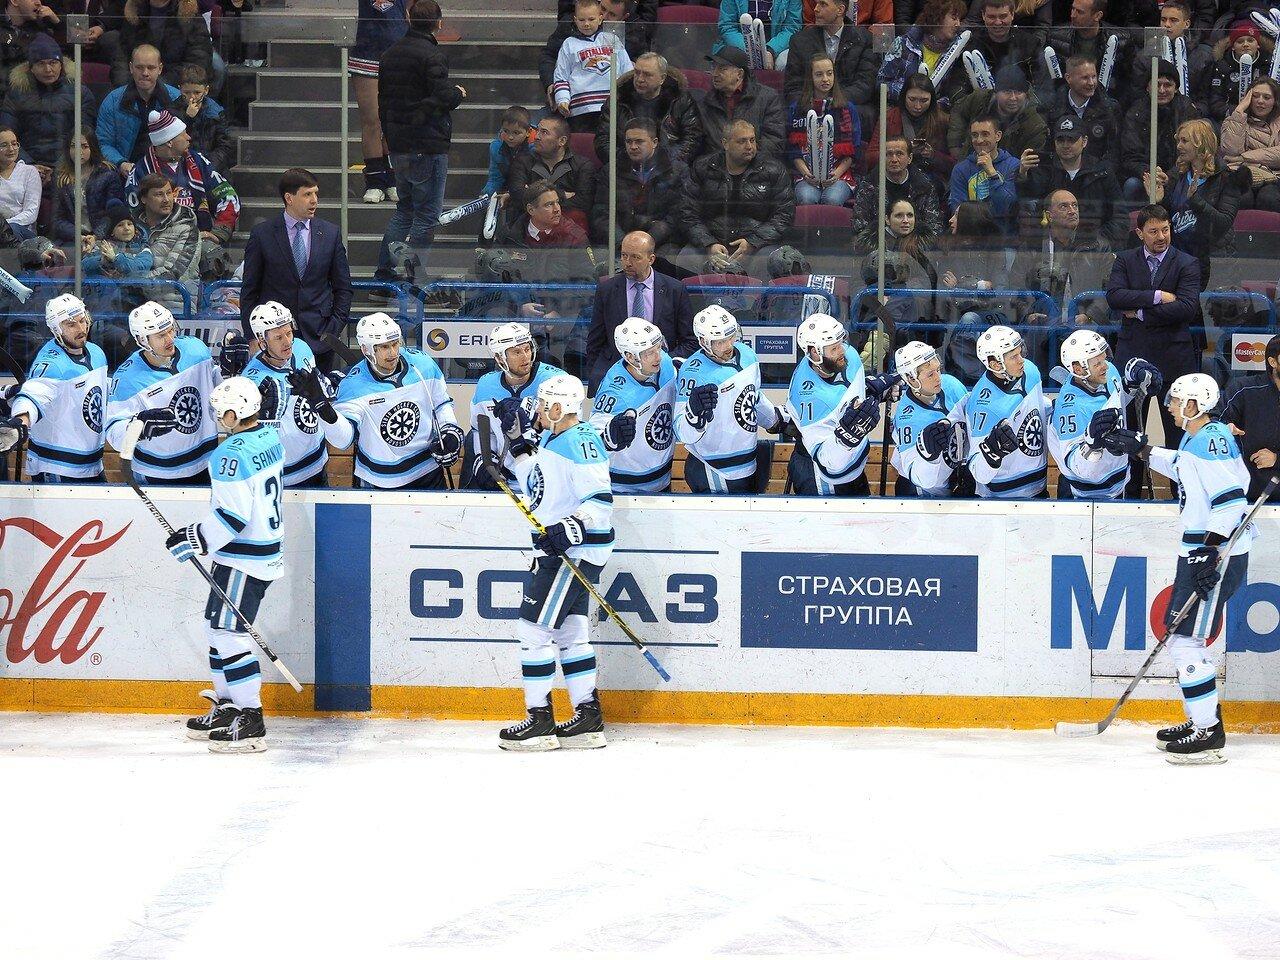 83Плей-офф 2016 Восток 1/2 Металлург - Сибирь 10.03.2016